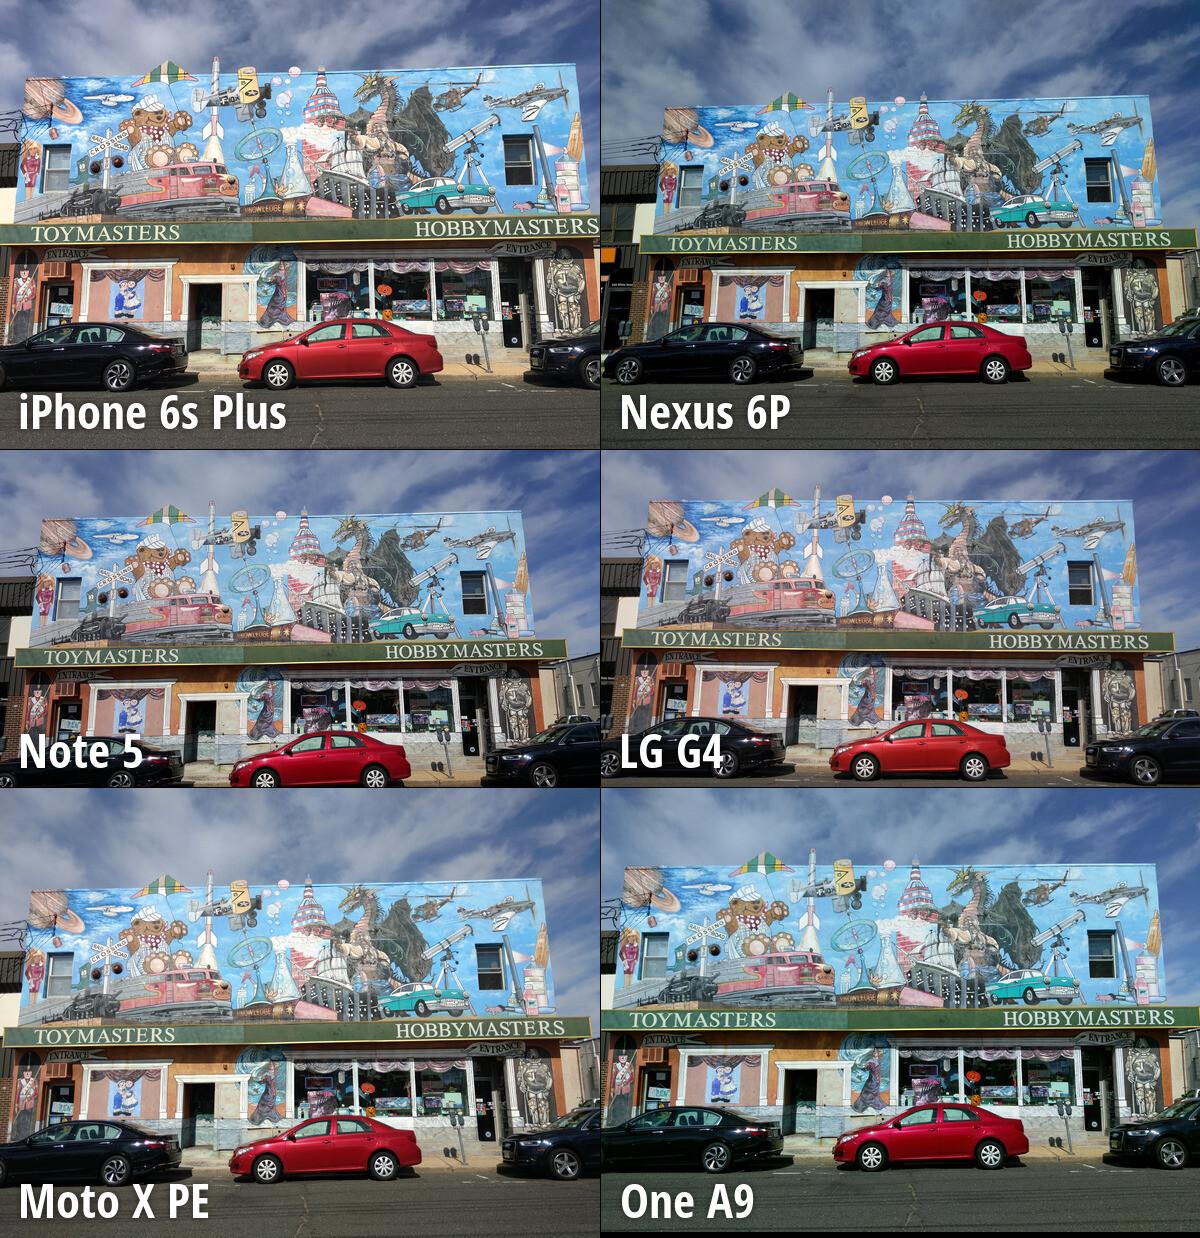 note 5 vs iphone 6s Plus vs xperia z3